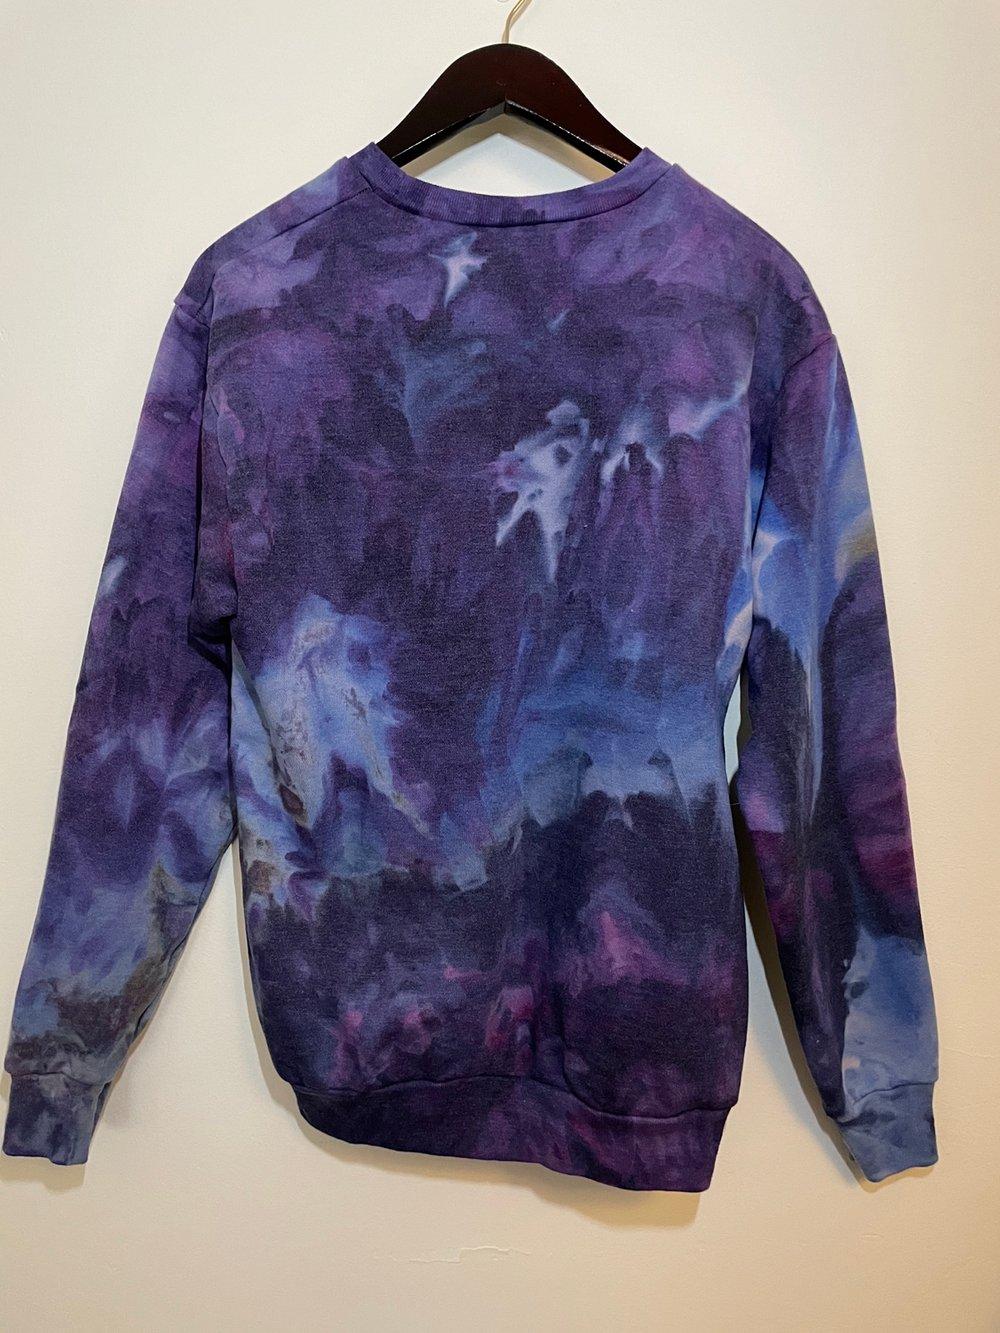 Tie-Dye Sweatshirt #2 - Medium